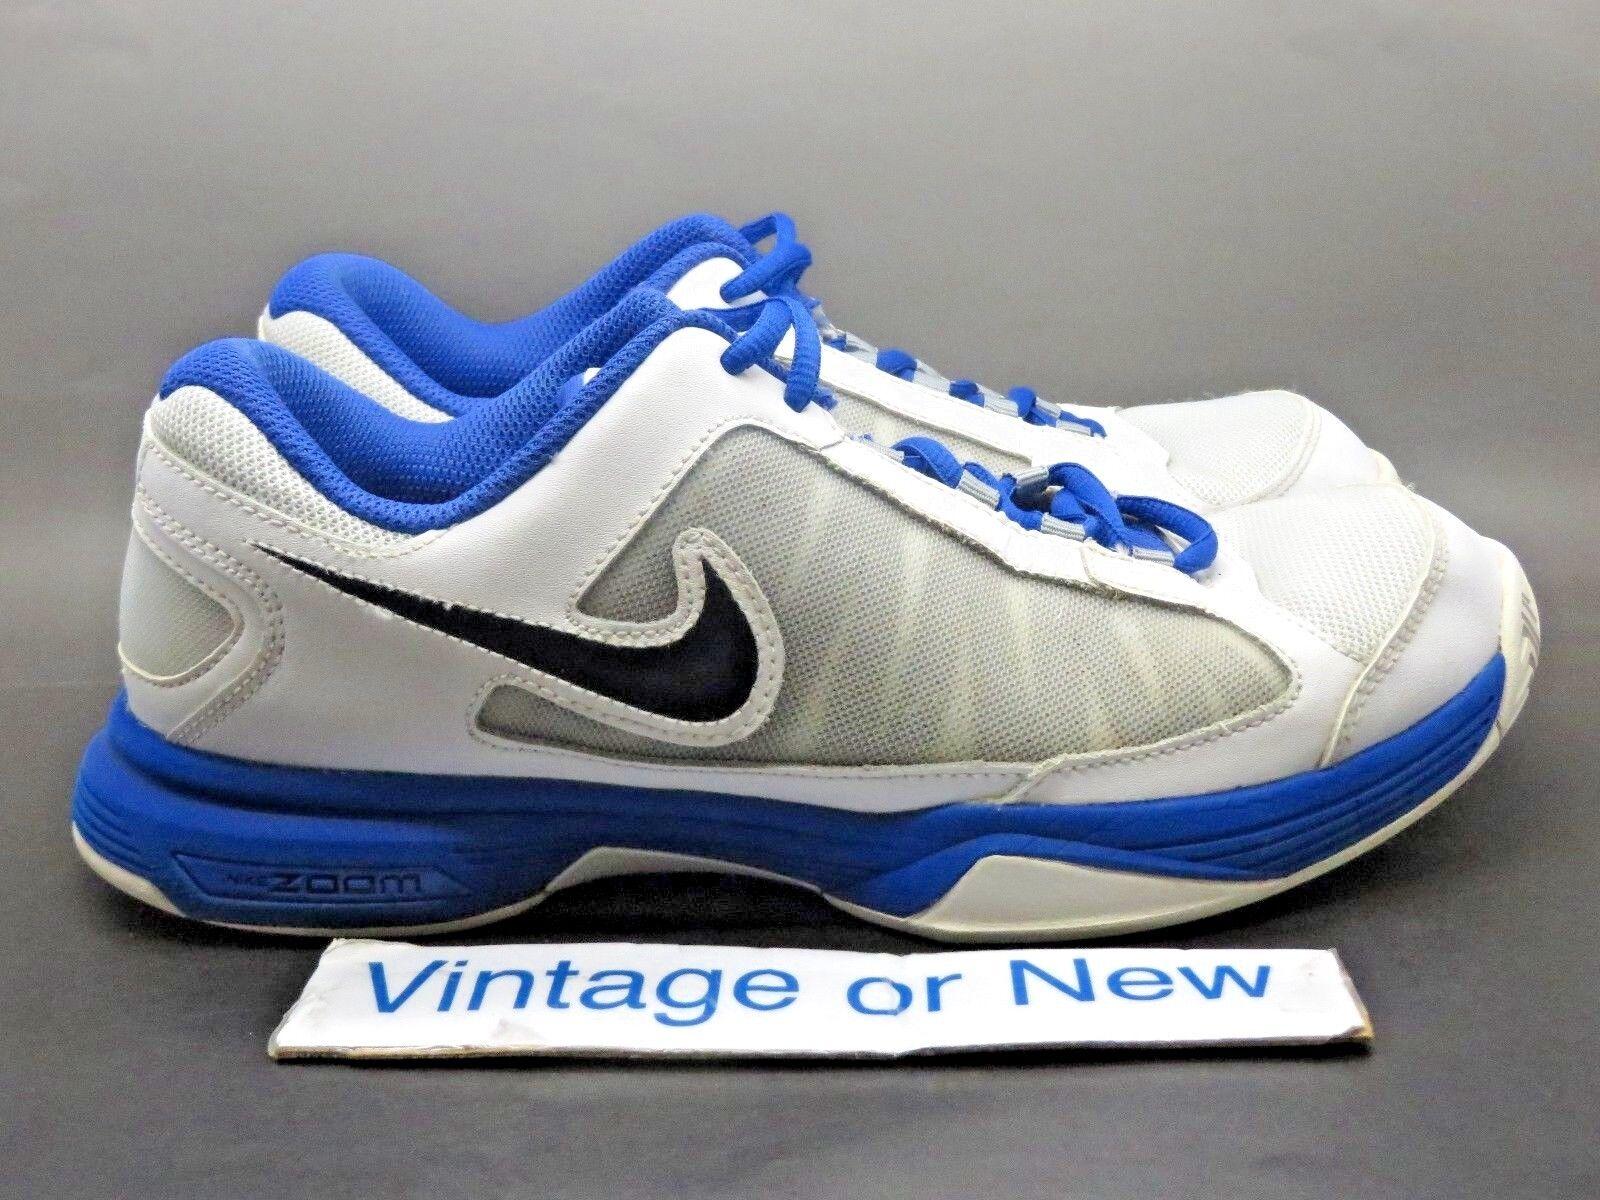 9ca9e689ec5d Women s Nike Zoom Courtlite Courtlite Courtlite 3 Platinum White Black Blue  Tennis 487996-001 sz